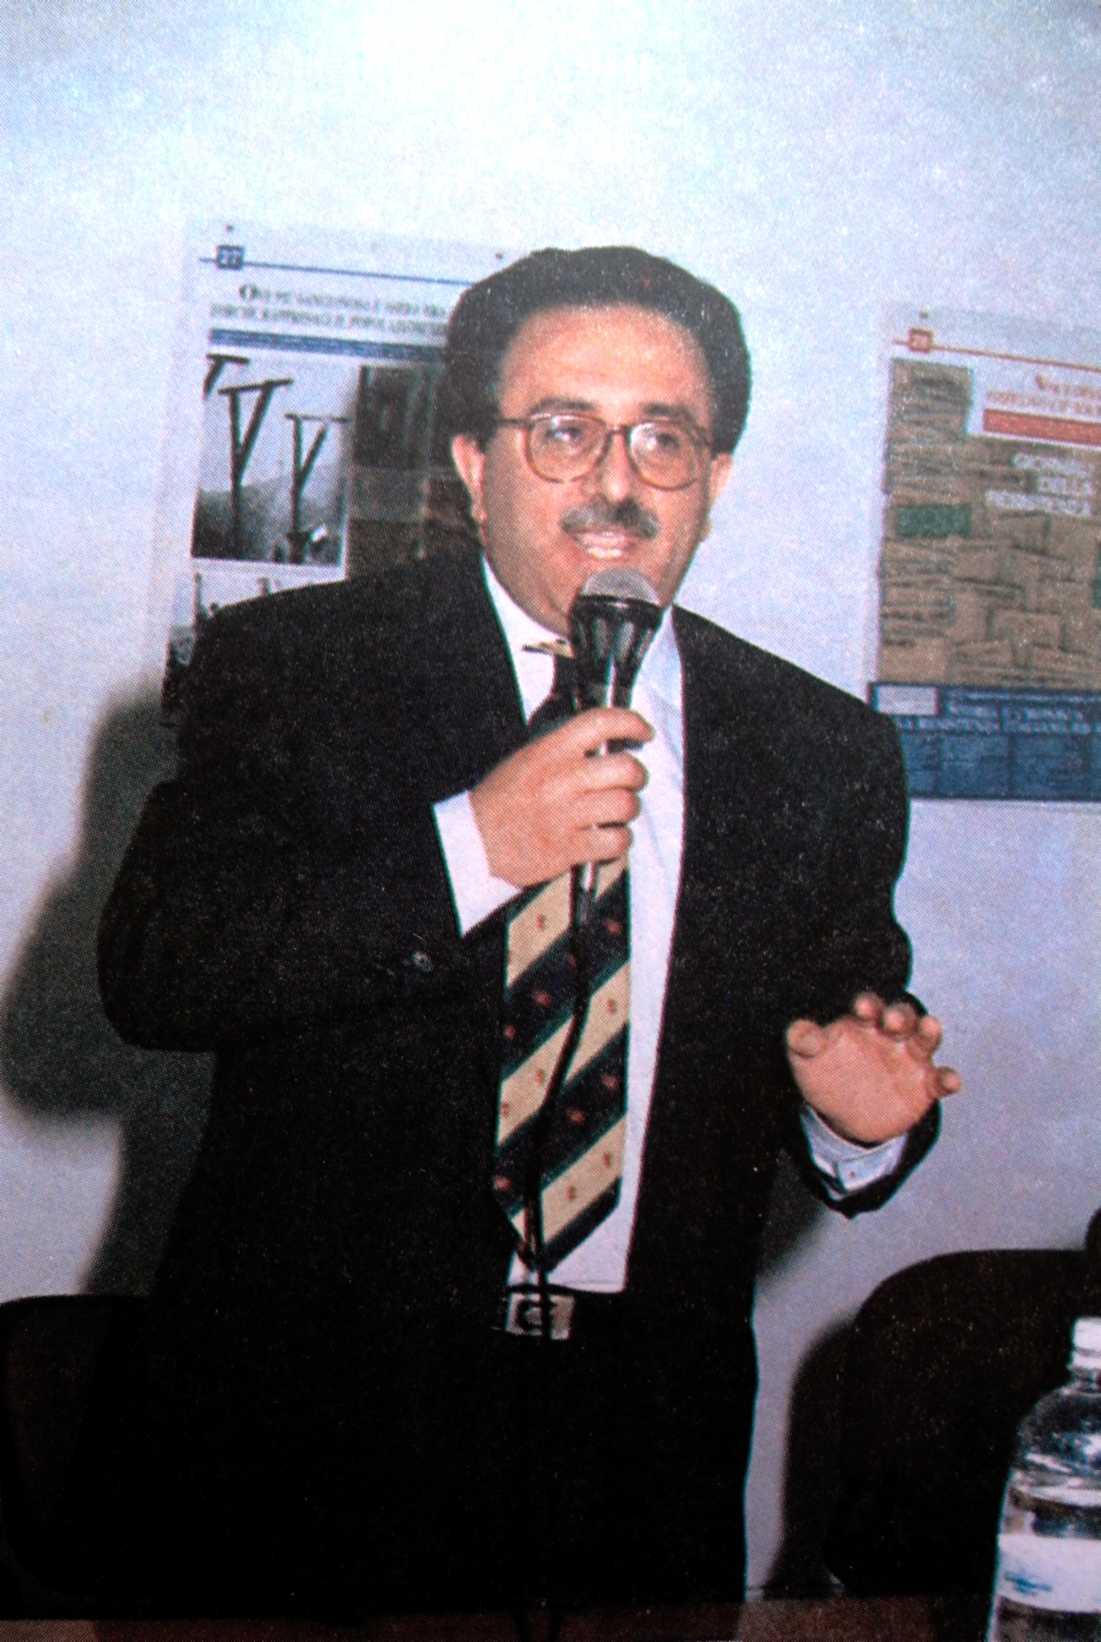 Giuseppe Galzerano